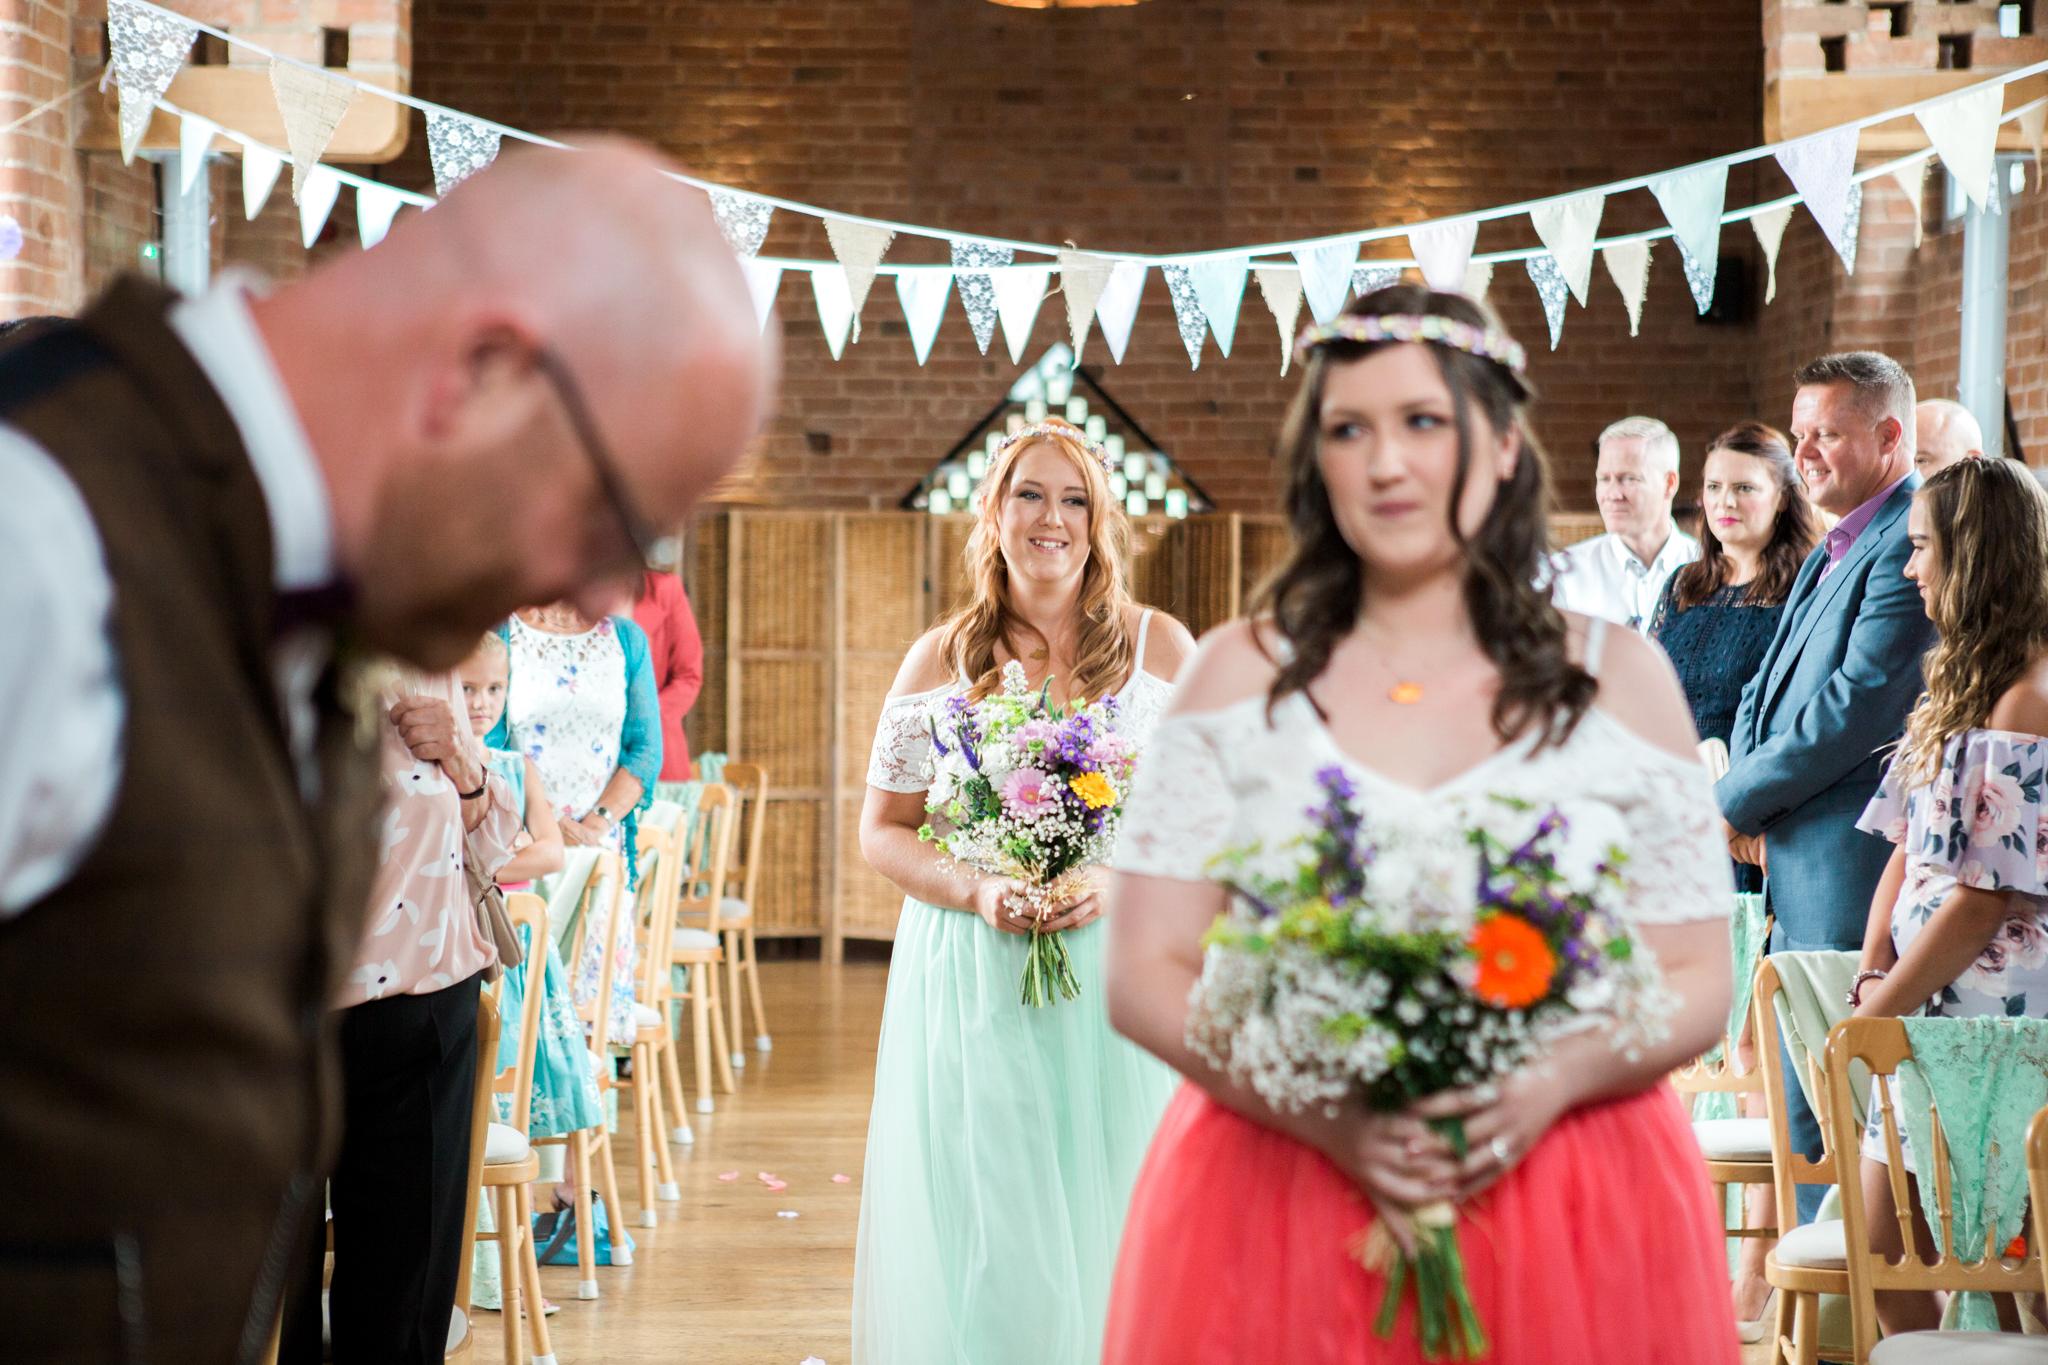 Rowsie & Lee, Swallows Nest Barn Wedding, Cotswold wedding photographer, Warwickshire Wedding Photographer-43.jpg